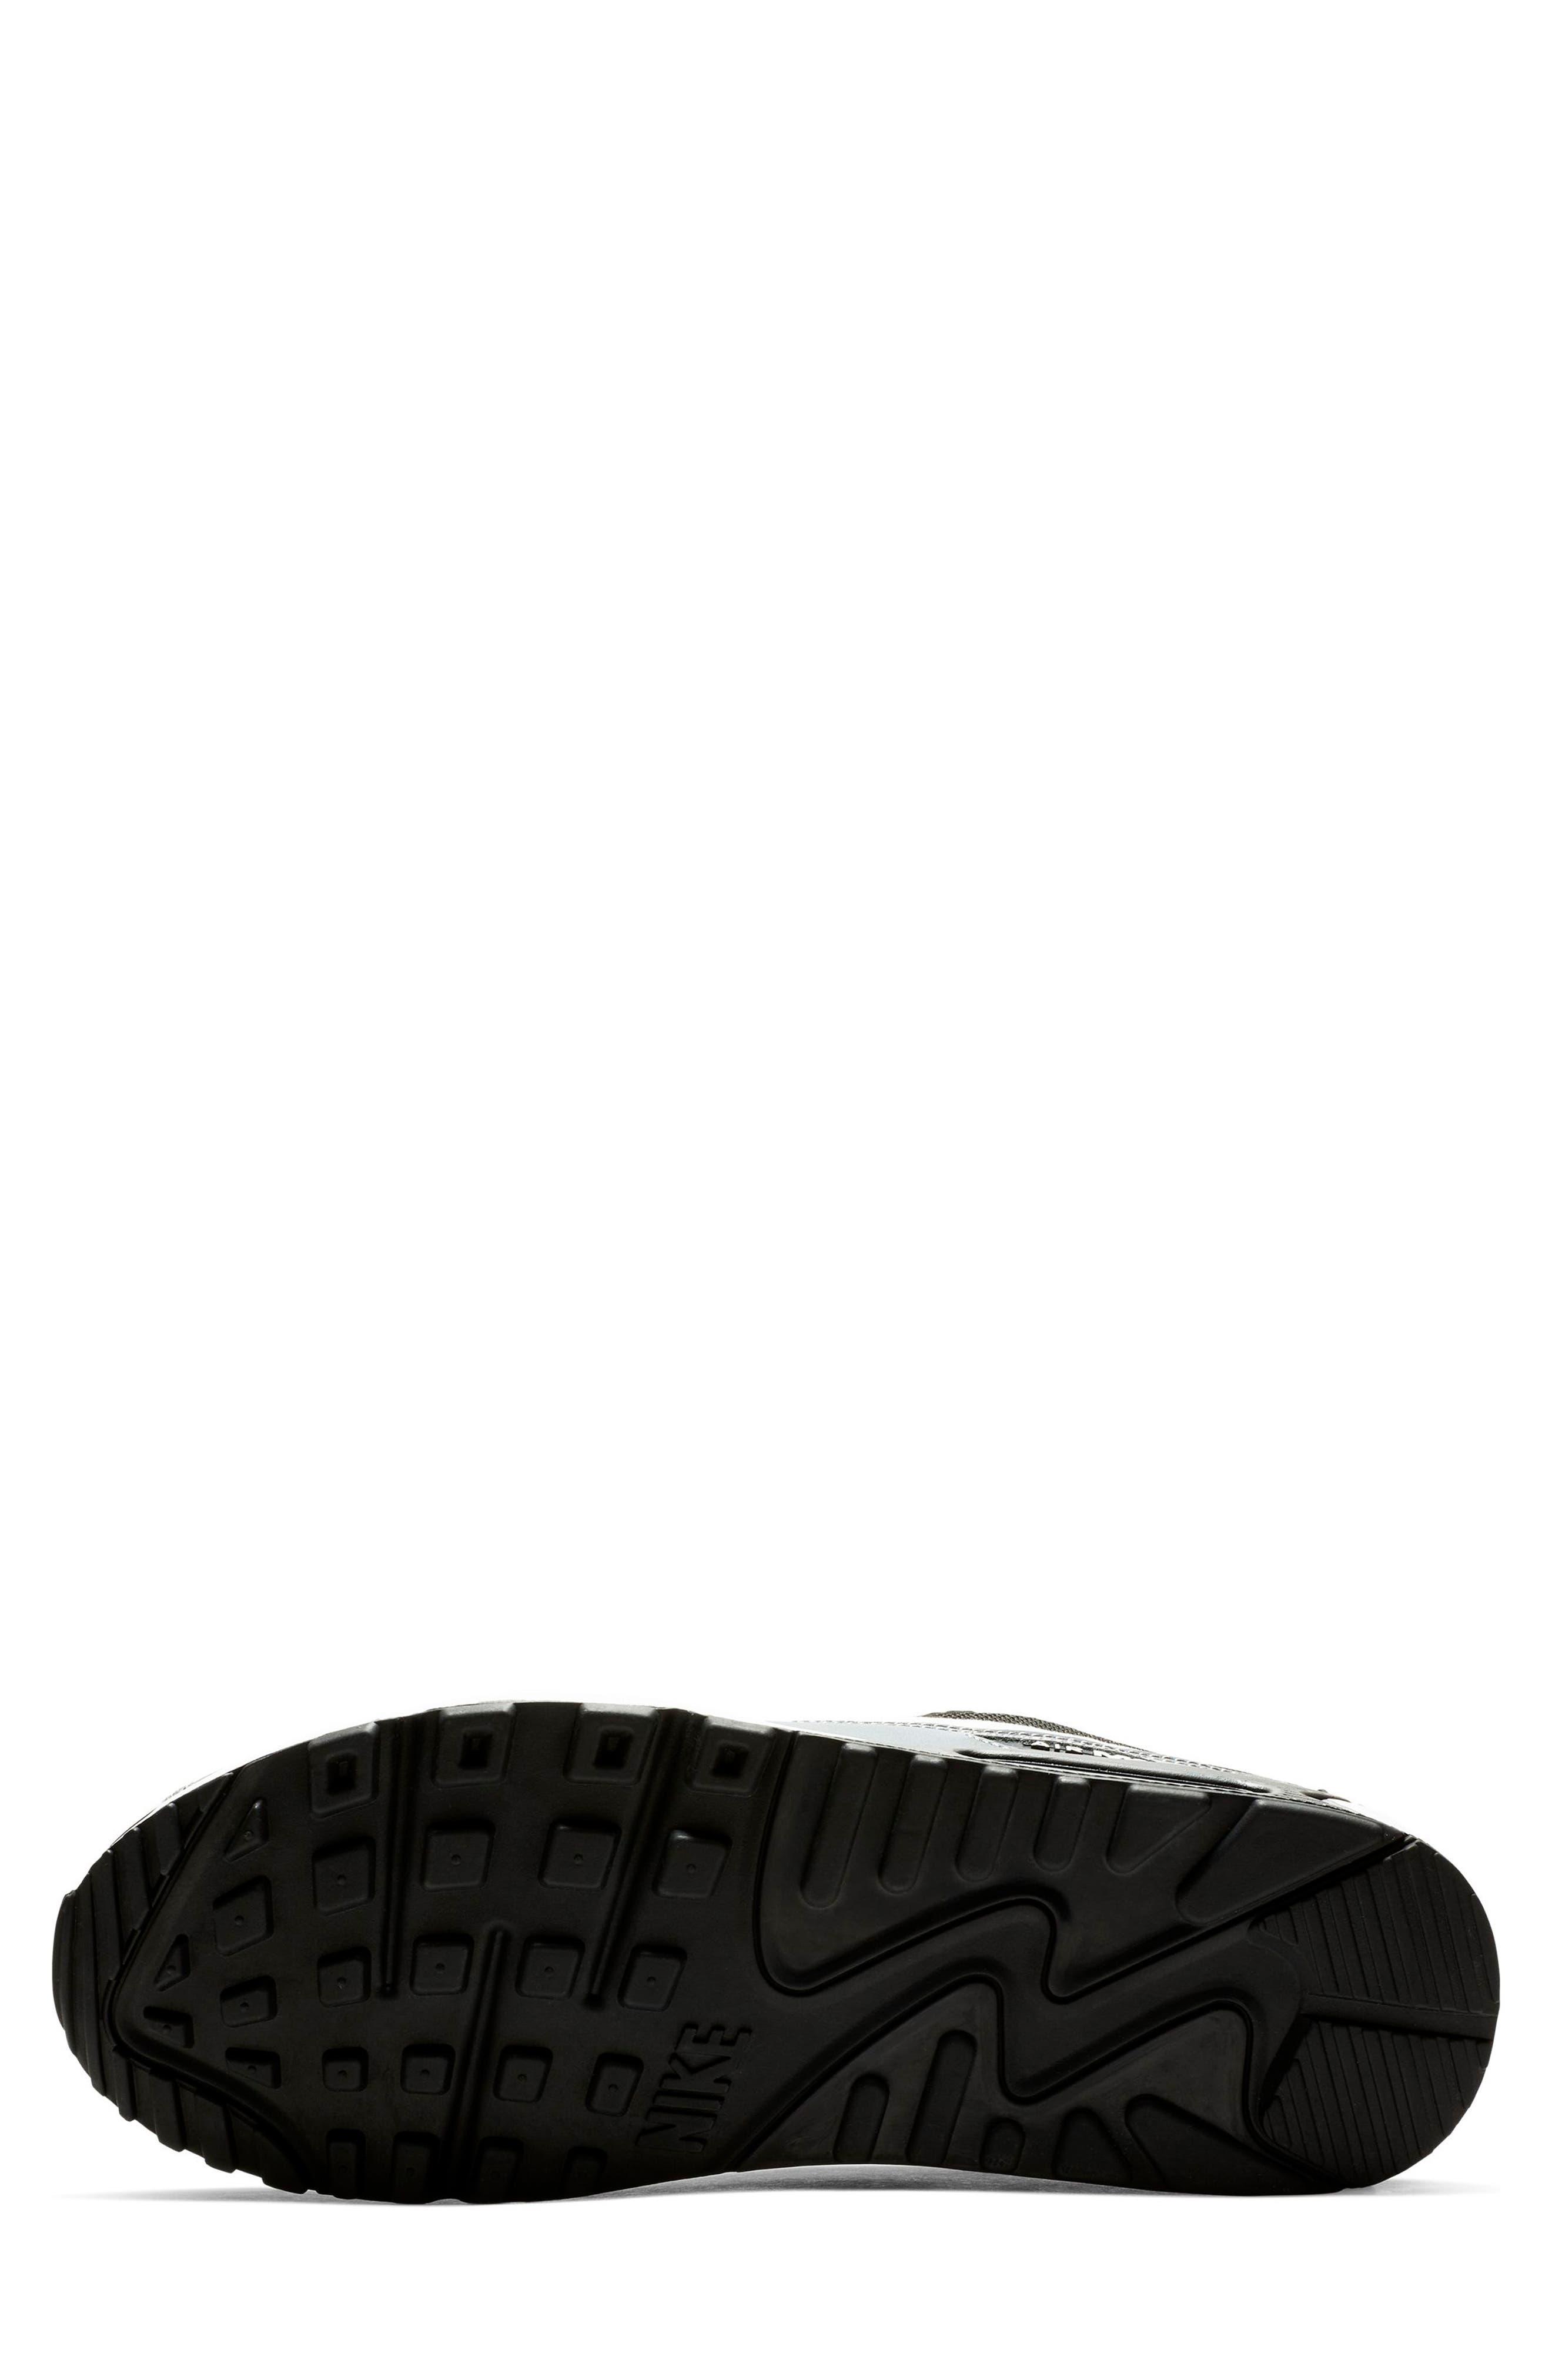 Air Max 90 Essential Sneaker,                             Alternate thumbnail 4, color,                             BLACK/ WHITE/ COOL GREY